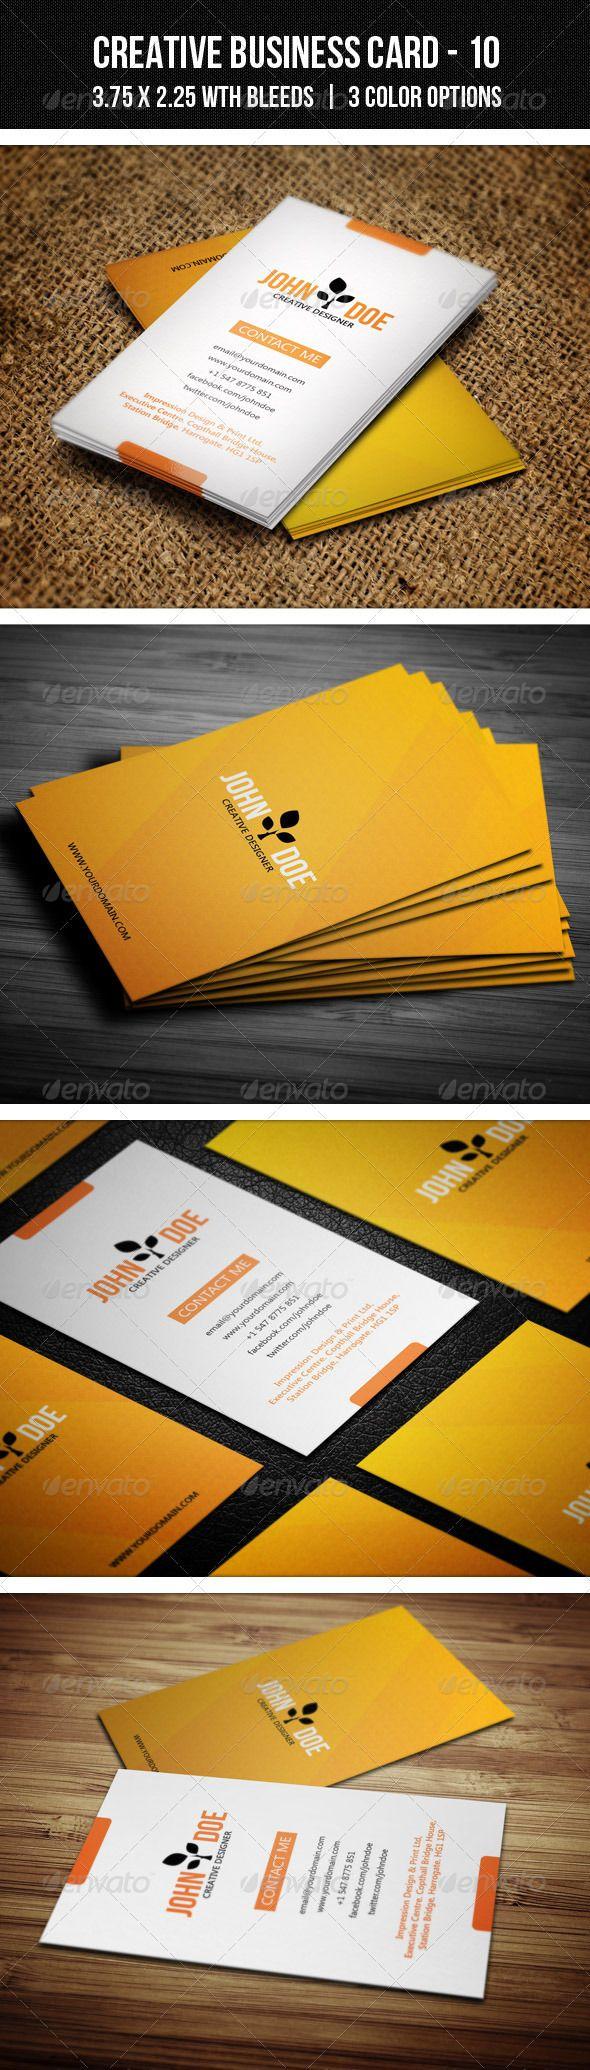 26 melhores imagens sobre business cards no pinterest cartes de creative business card 10 creative business cards download here https reheart Choice Image